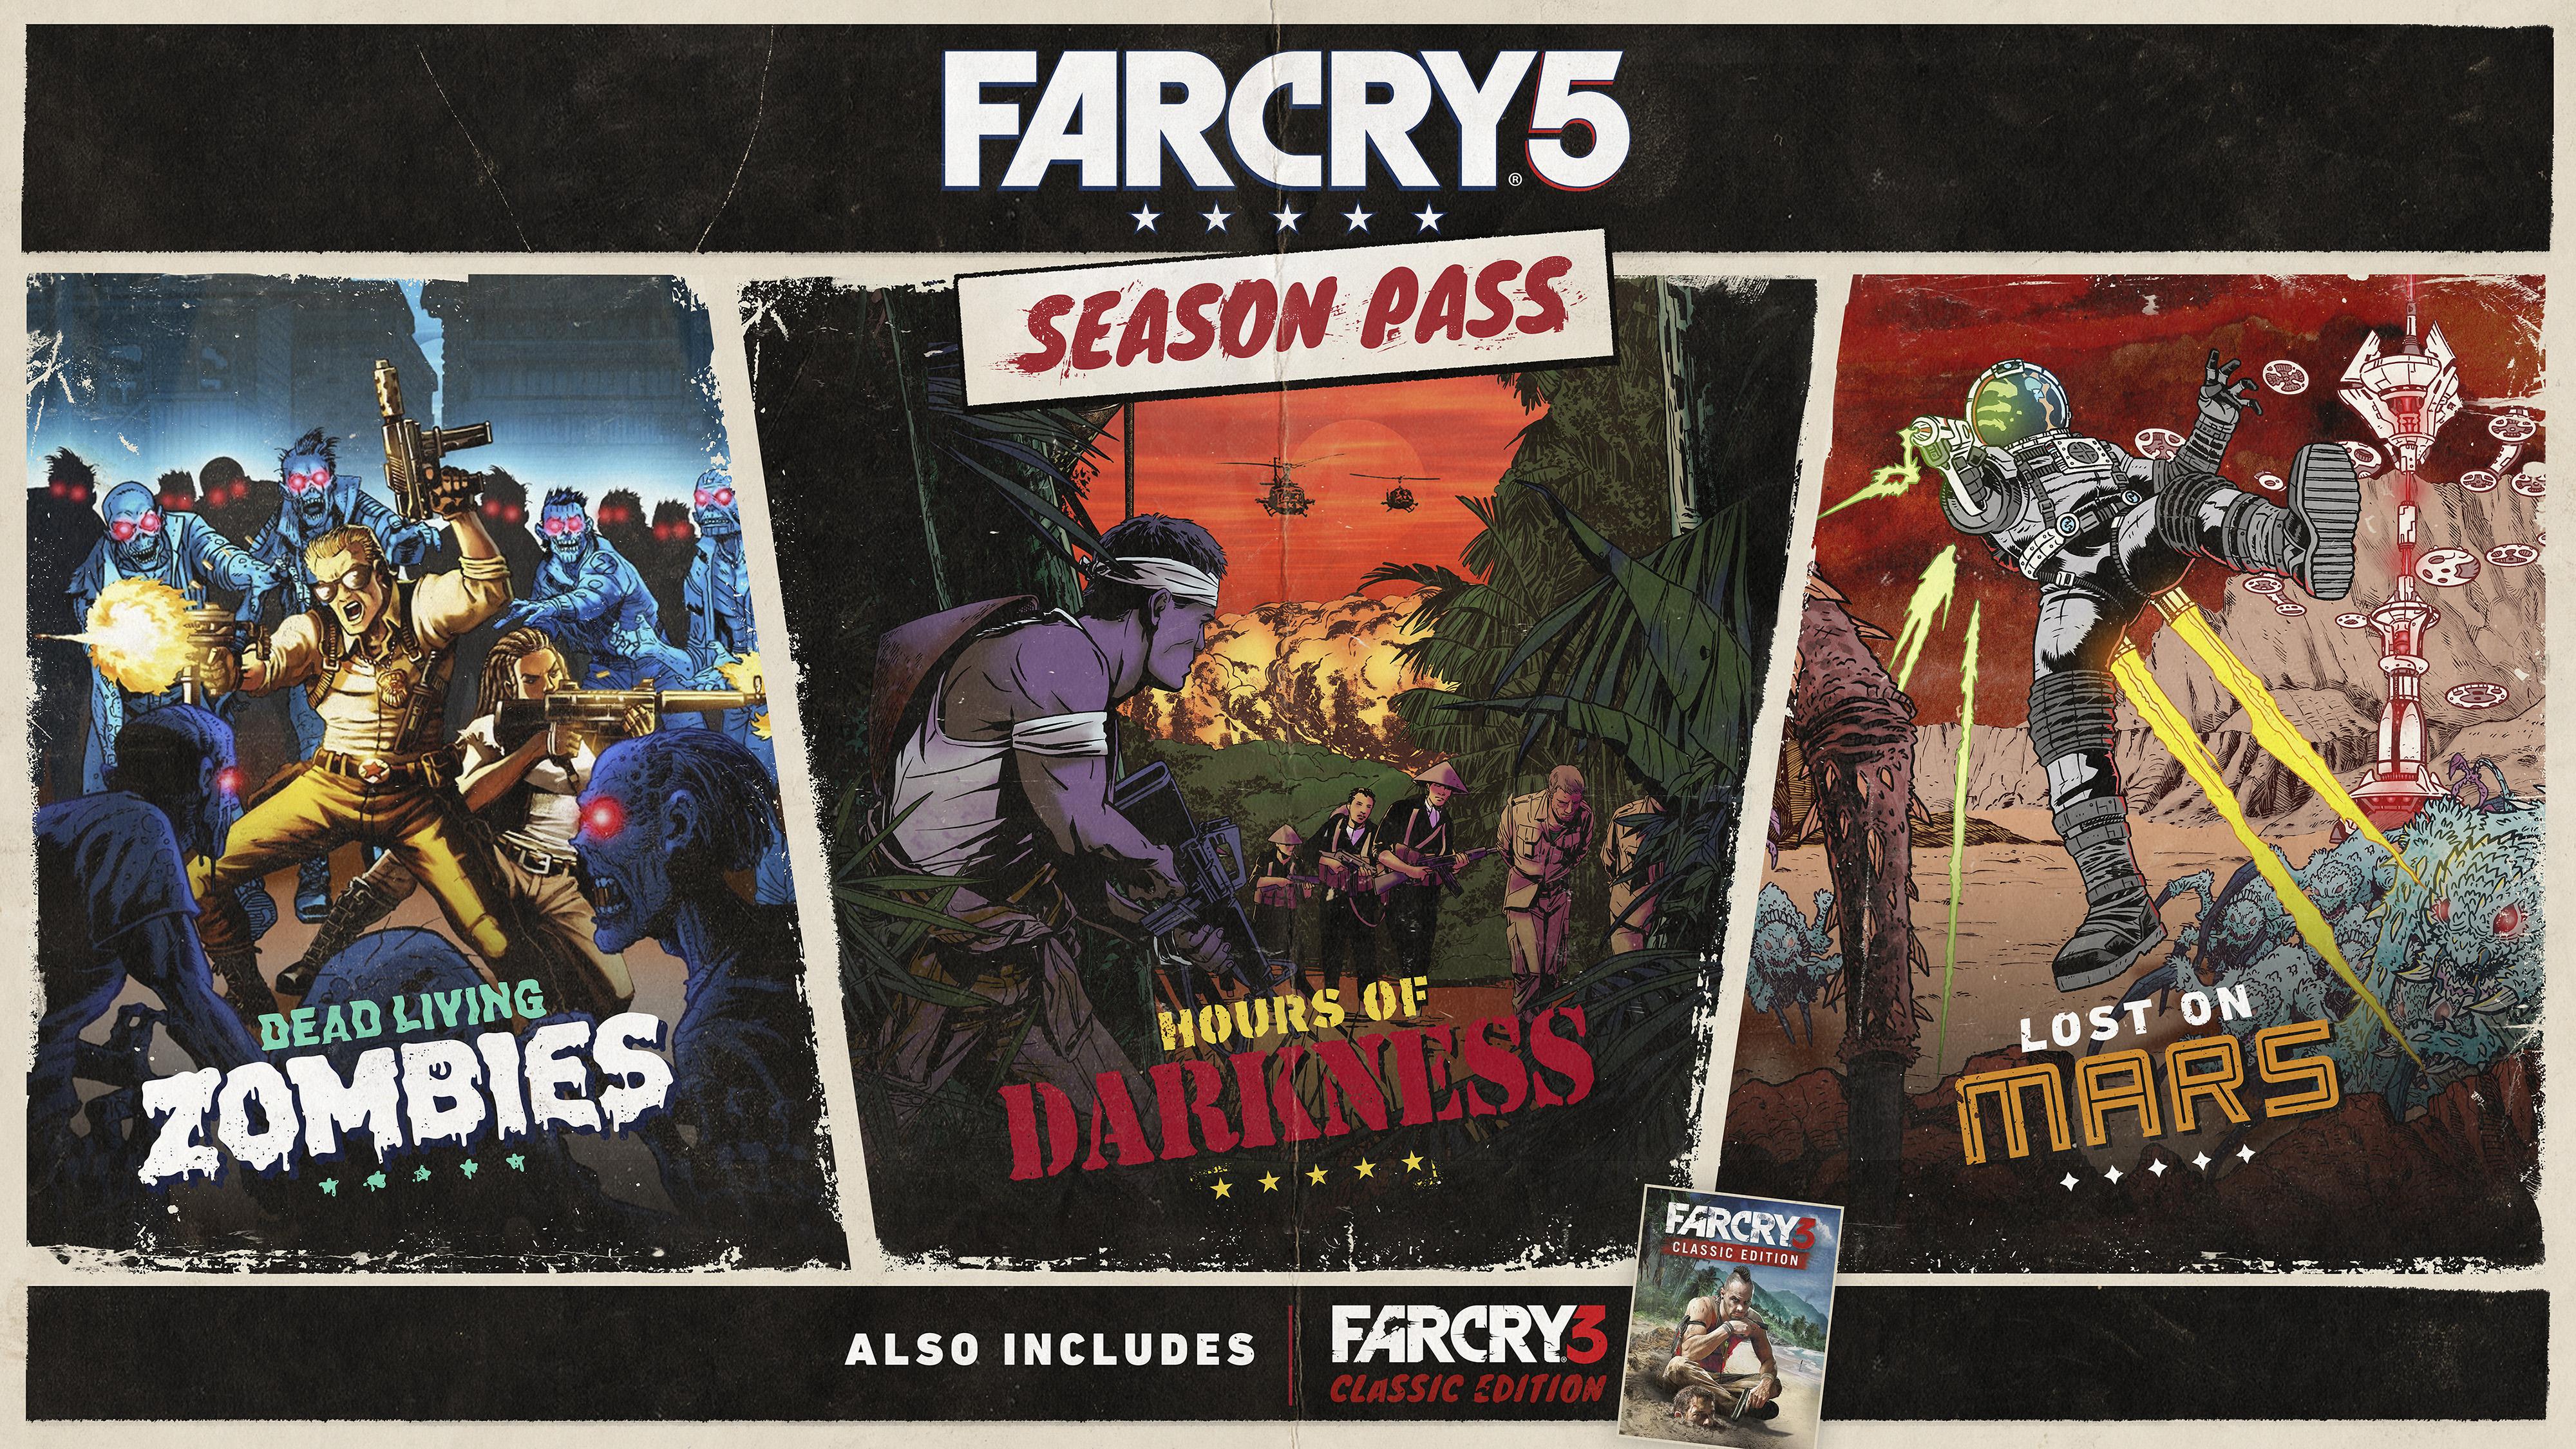 Far Cry 5 Season Pass Key Art